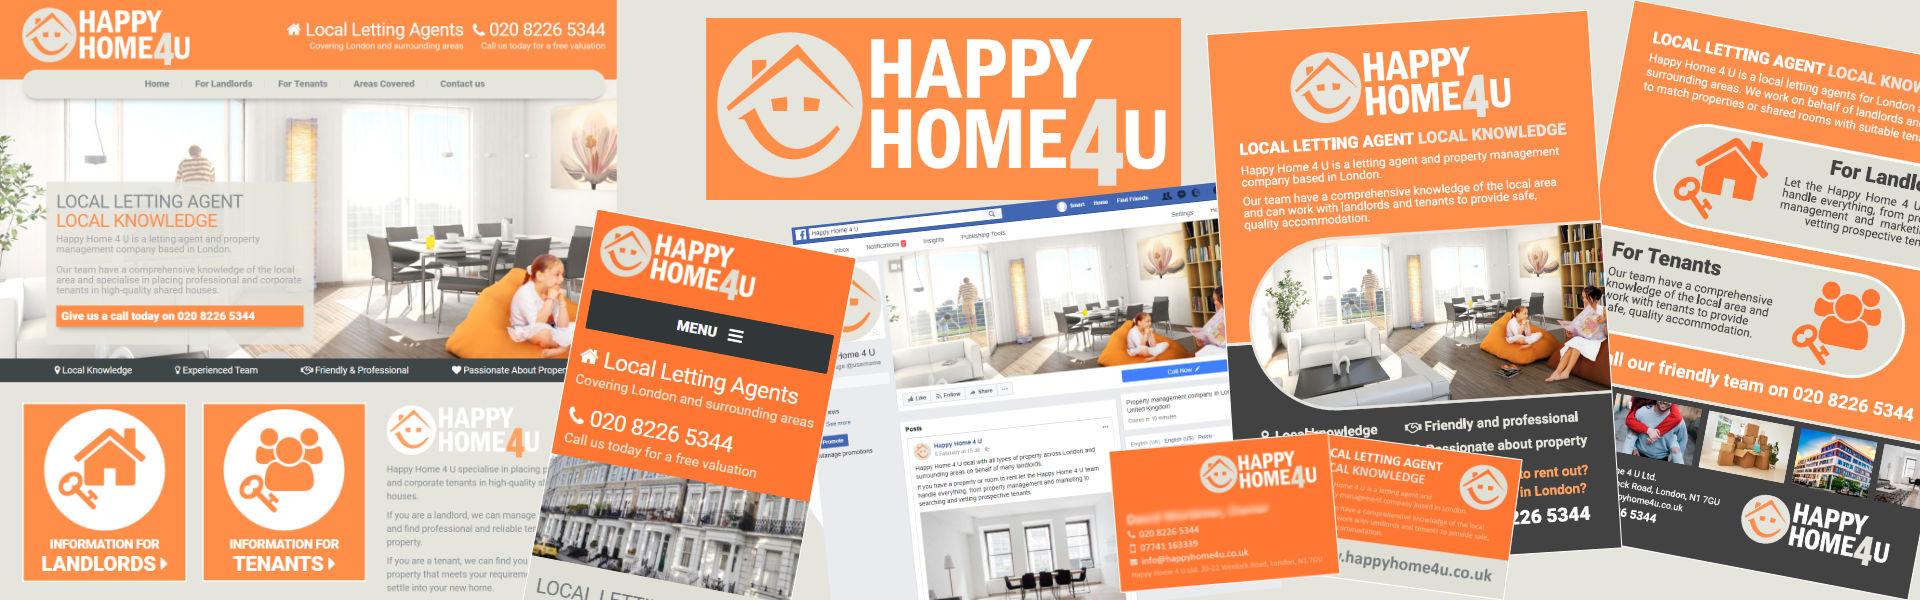 Happy Home 4u Graphic Design Case Study